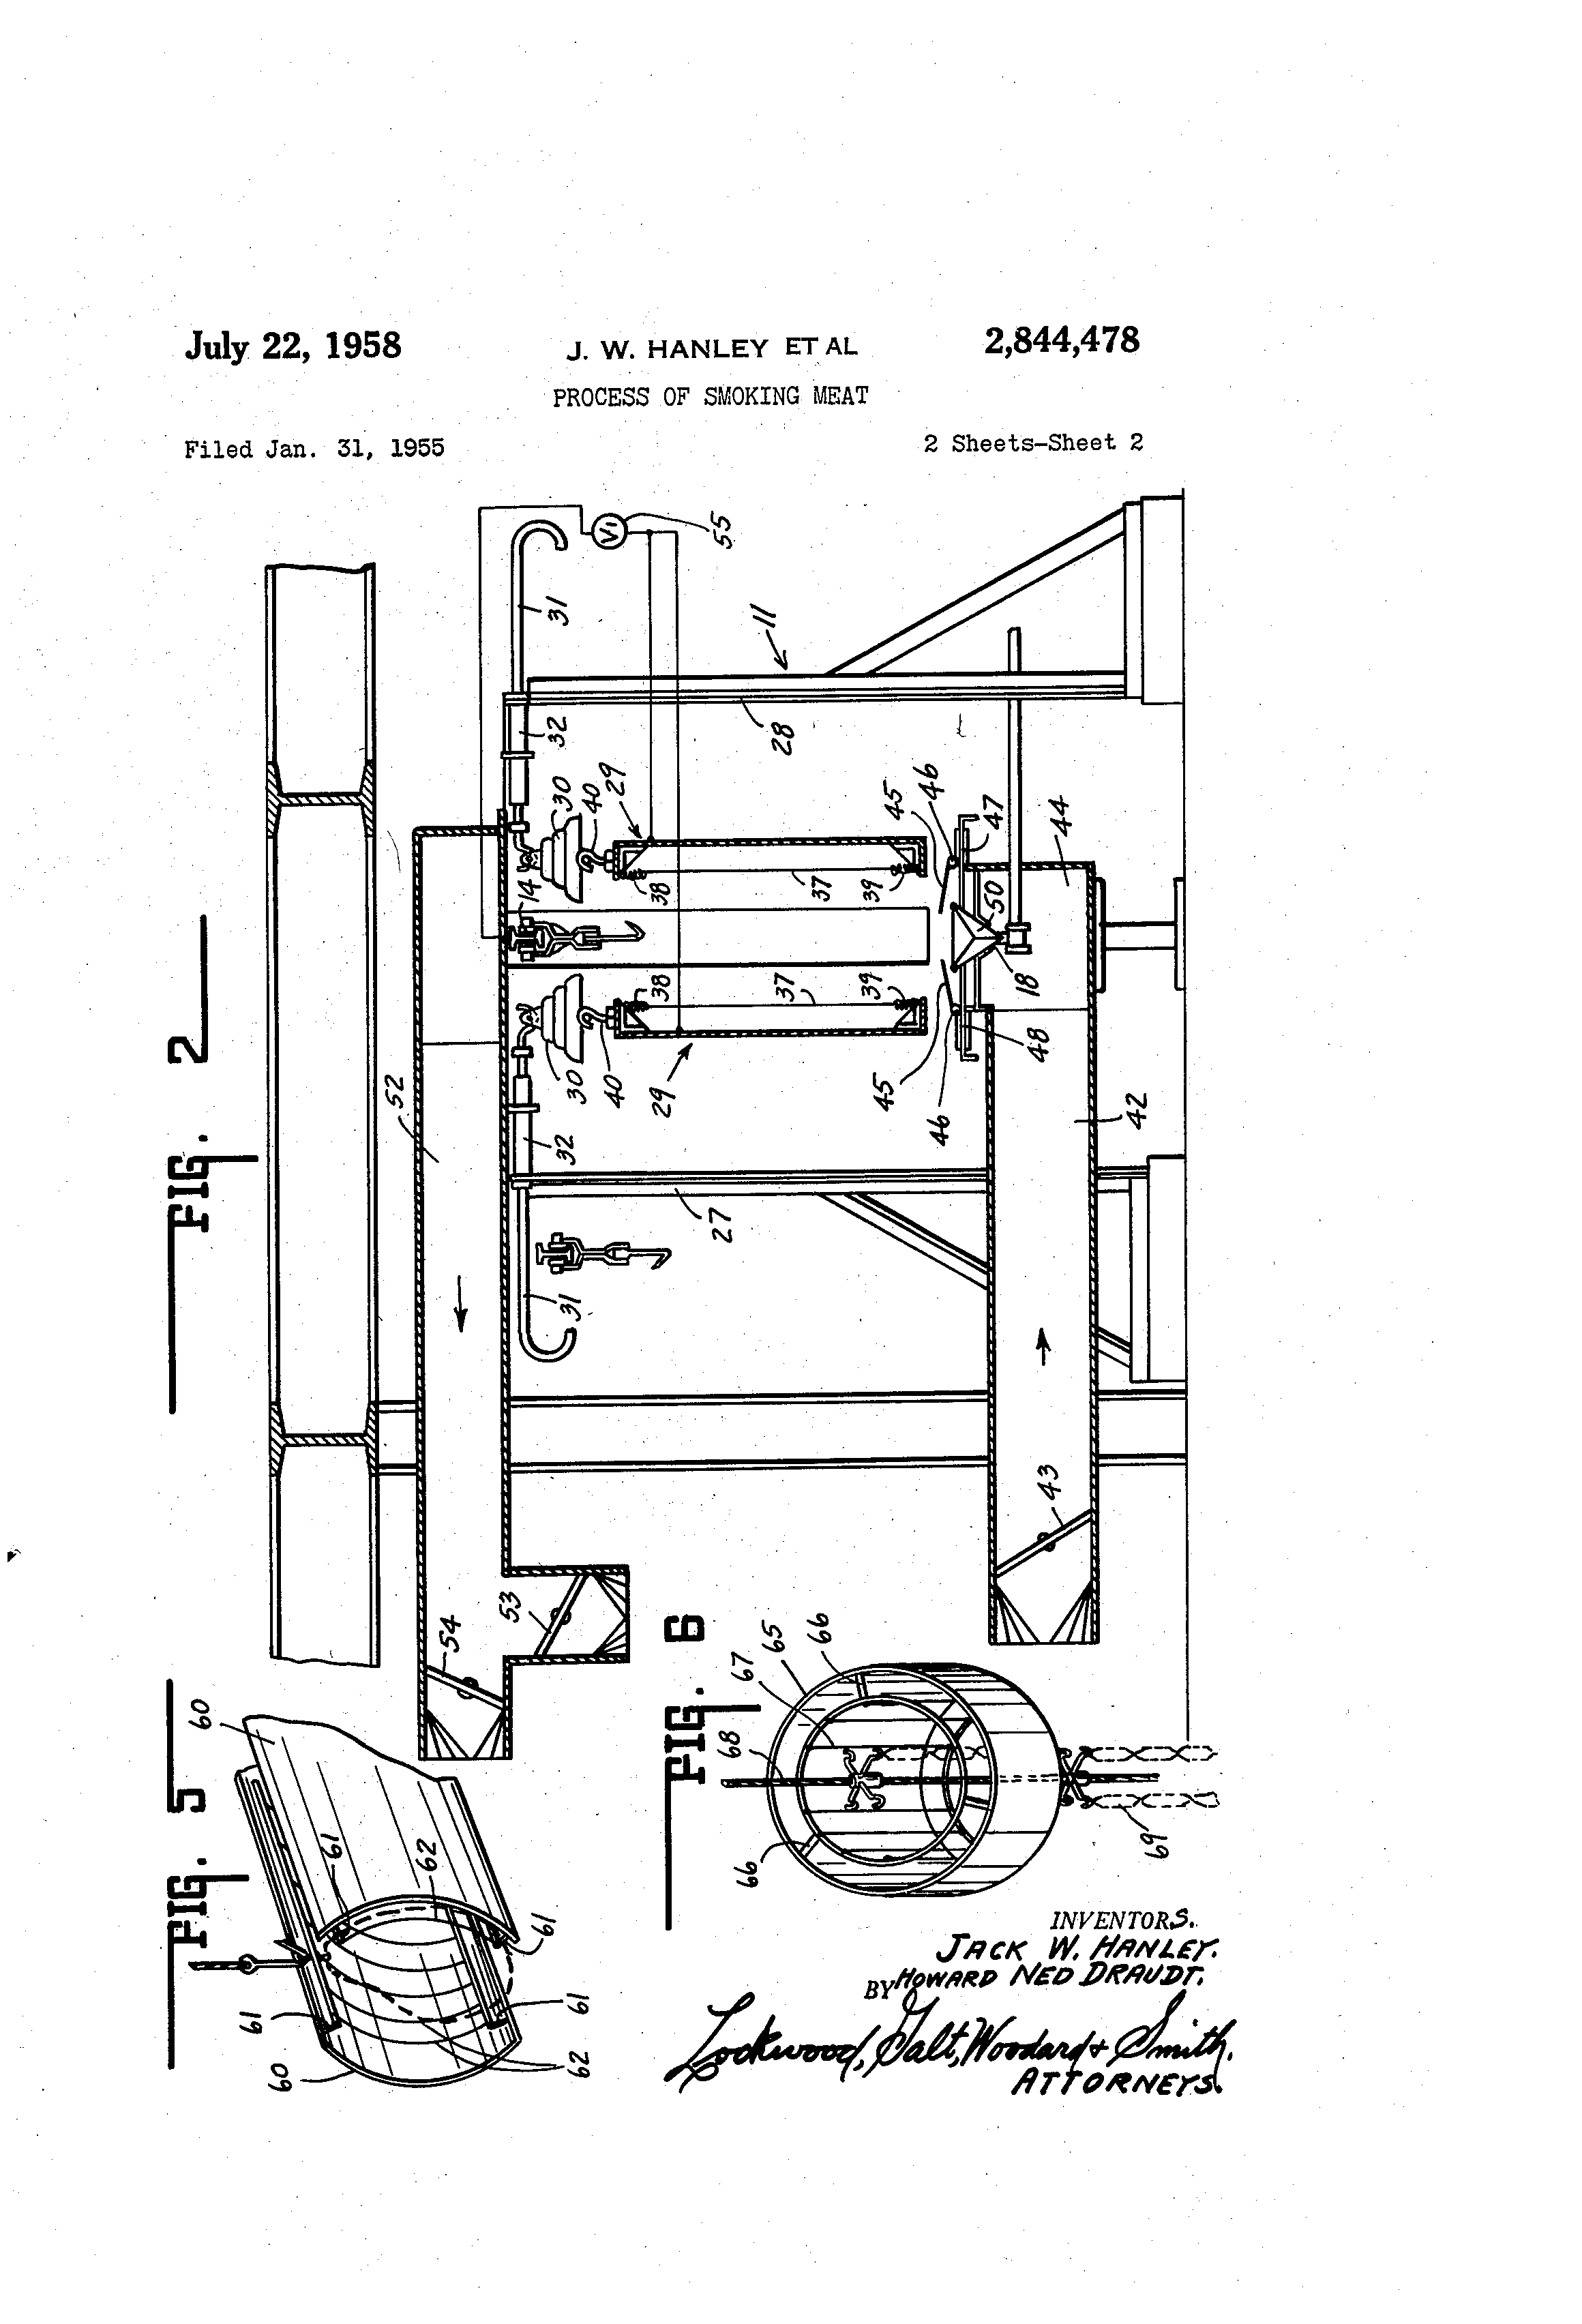 designs diagram of smoking meat